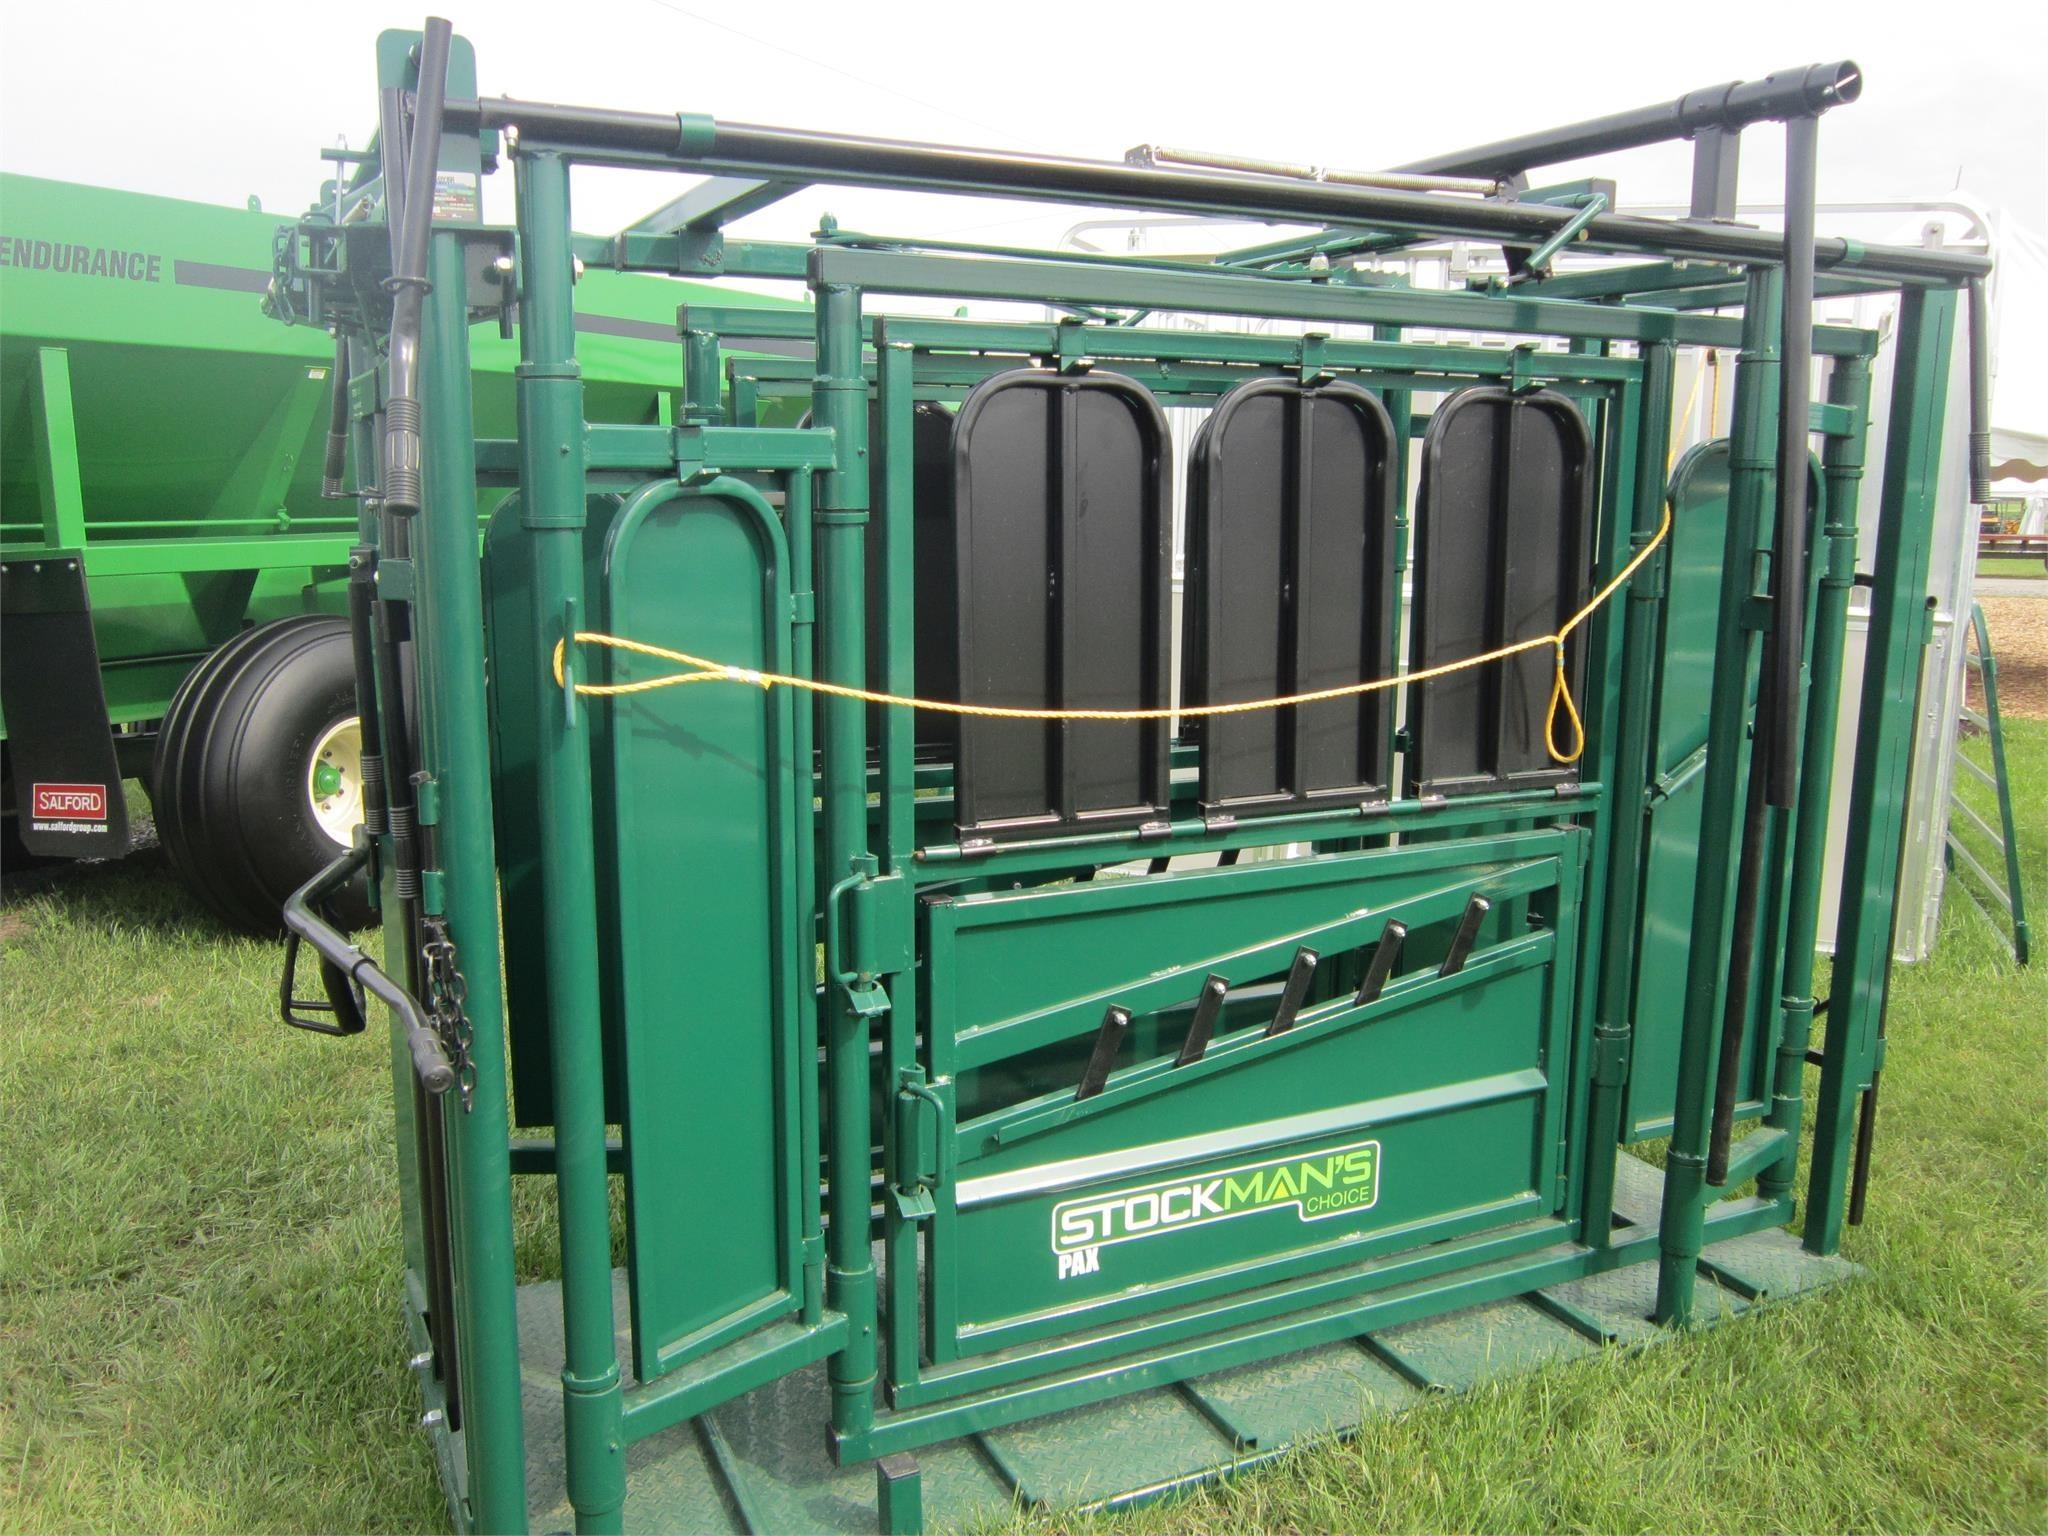 2021 Stockman's Choice PAX Cattle Equipment